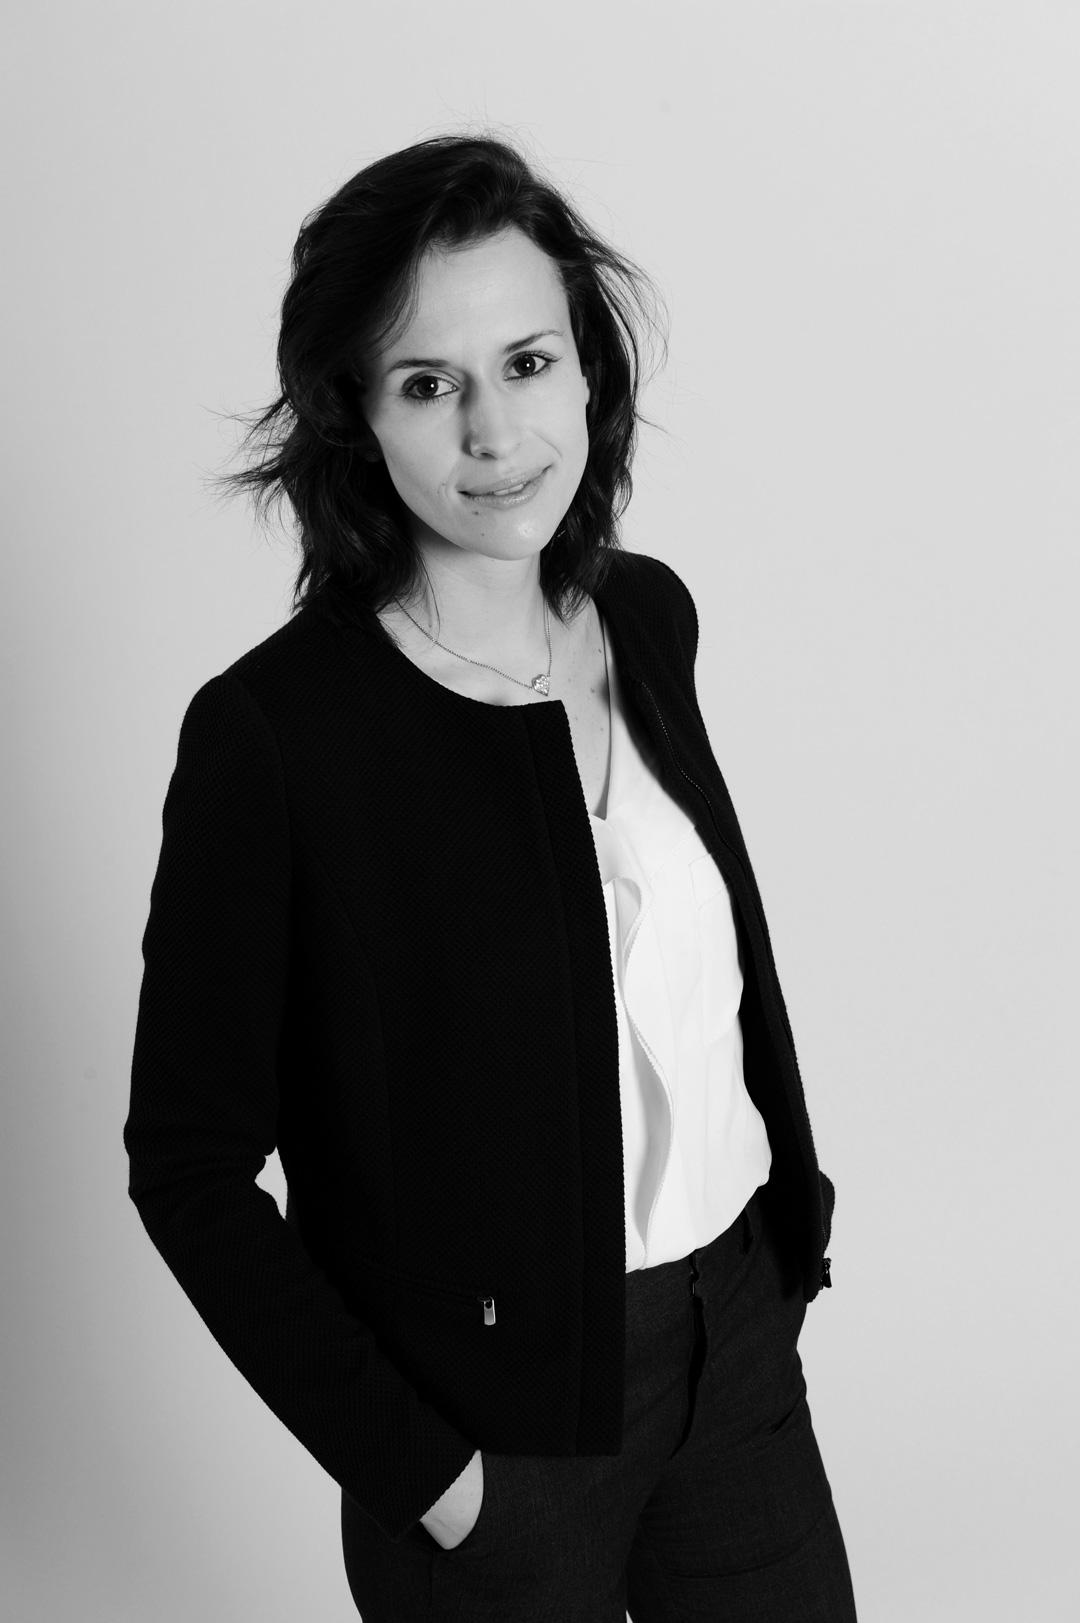 Picture of Allegra Kowalewski-Ferreira